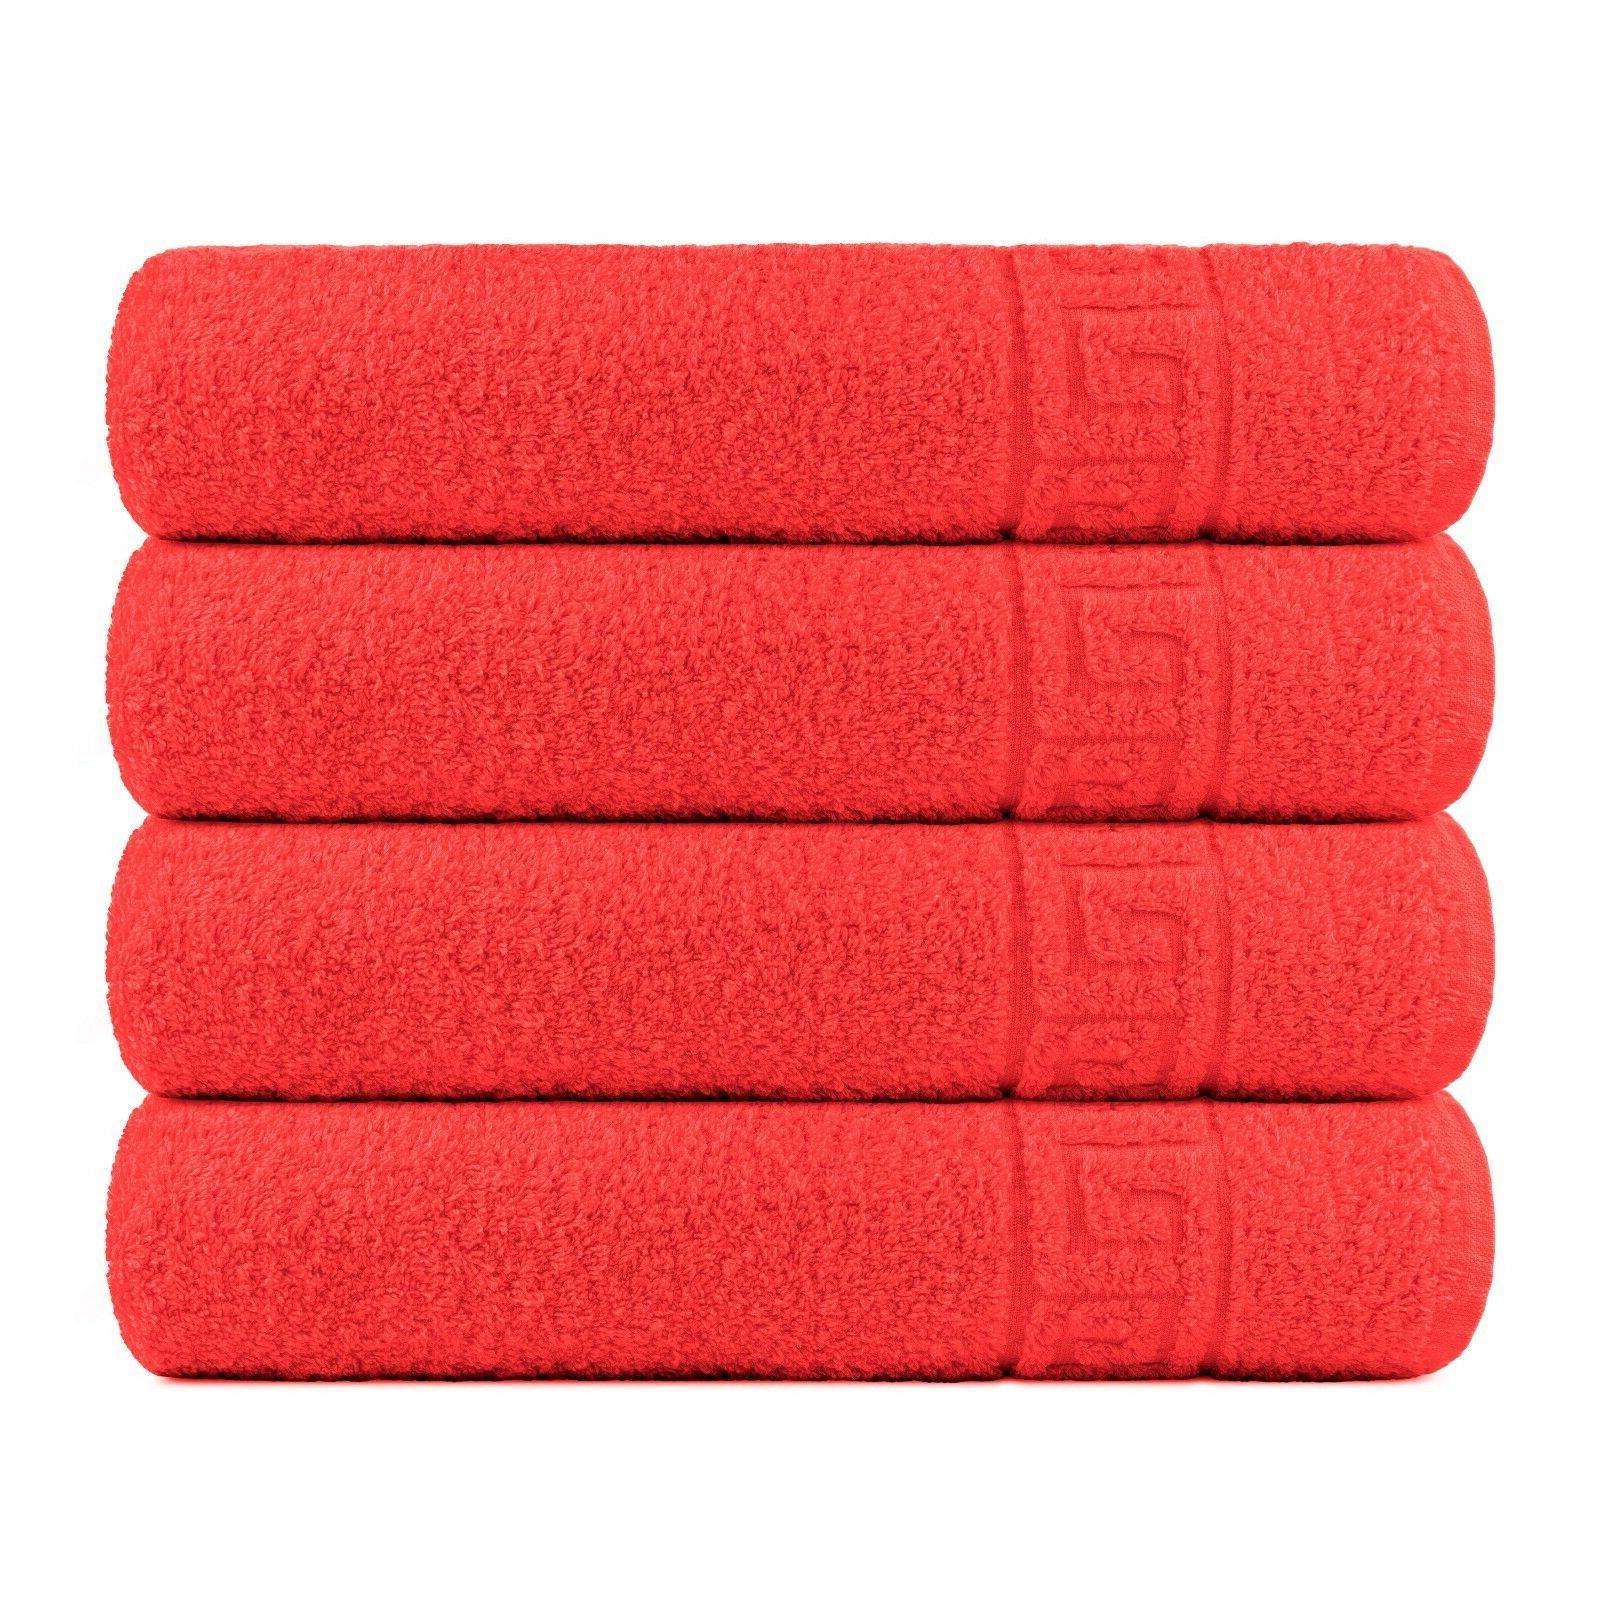 Bath Towel Cotton Set 4 Pcs Towels 28x56 Inch Absorbent